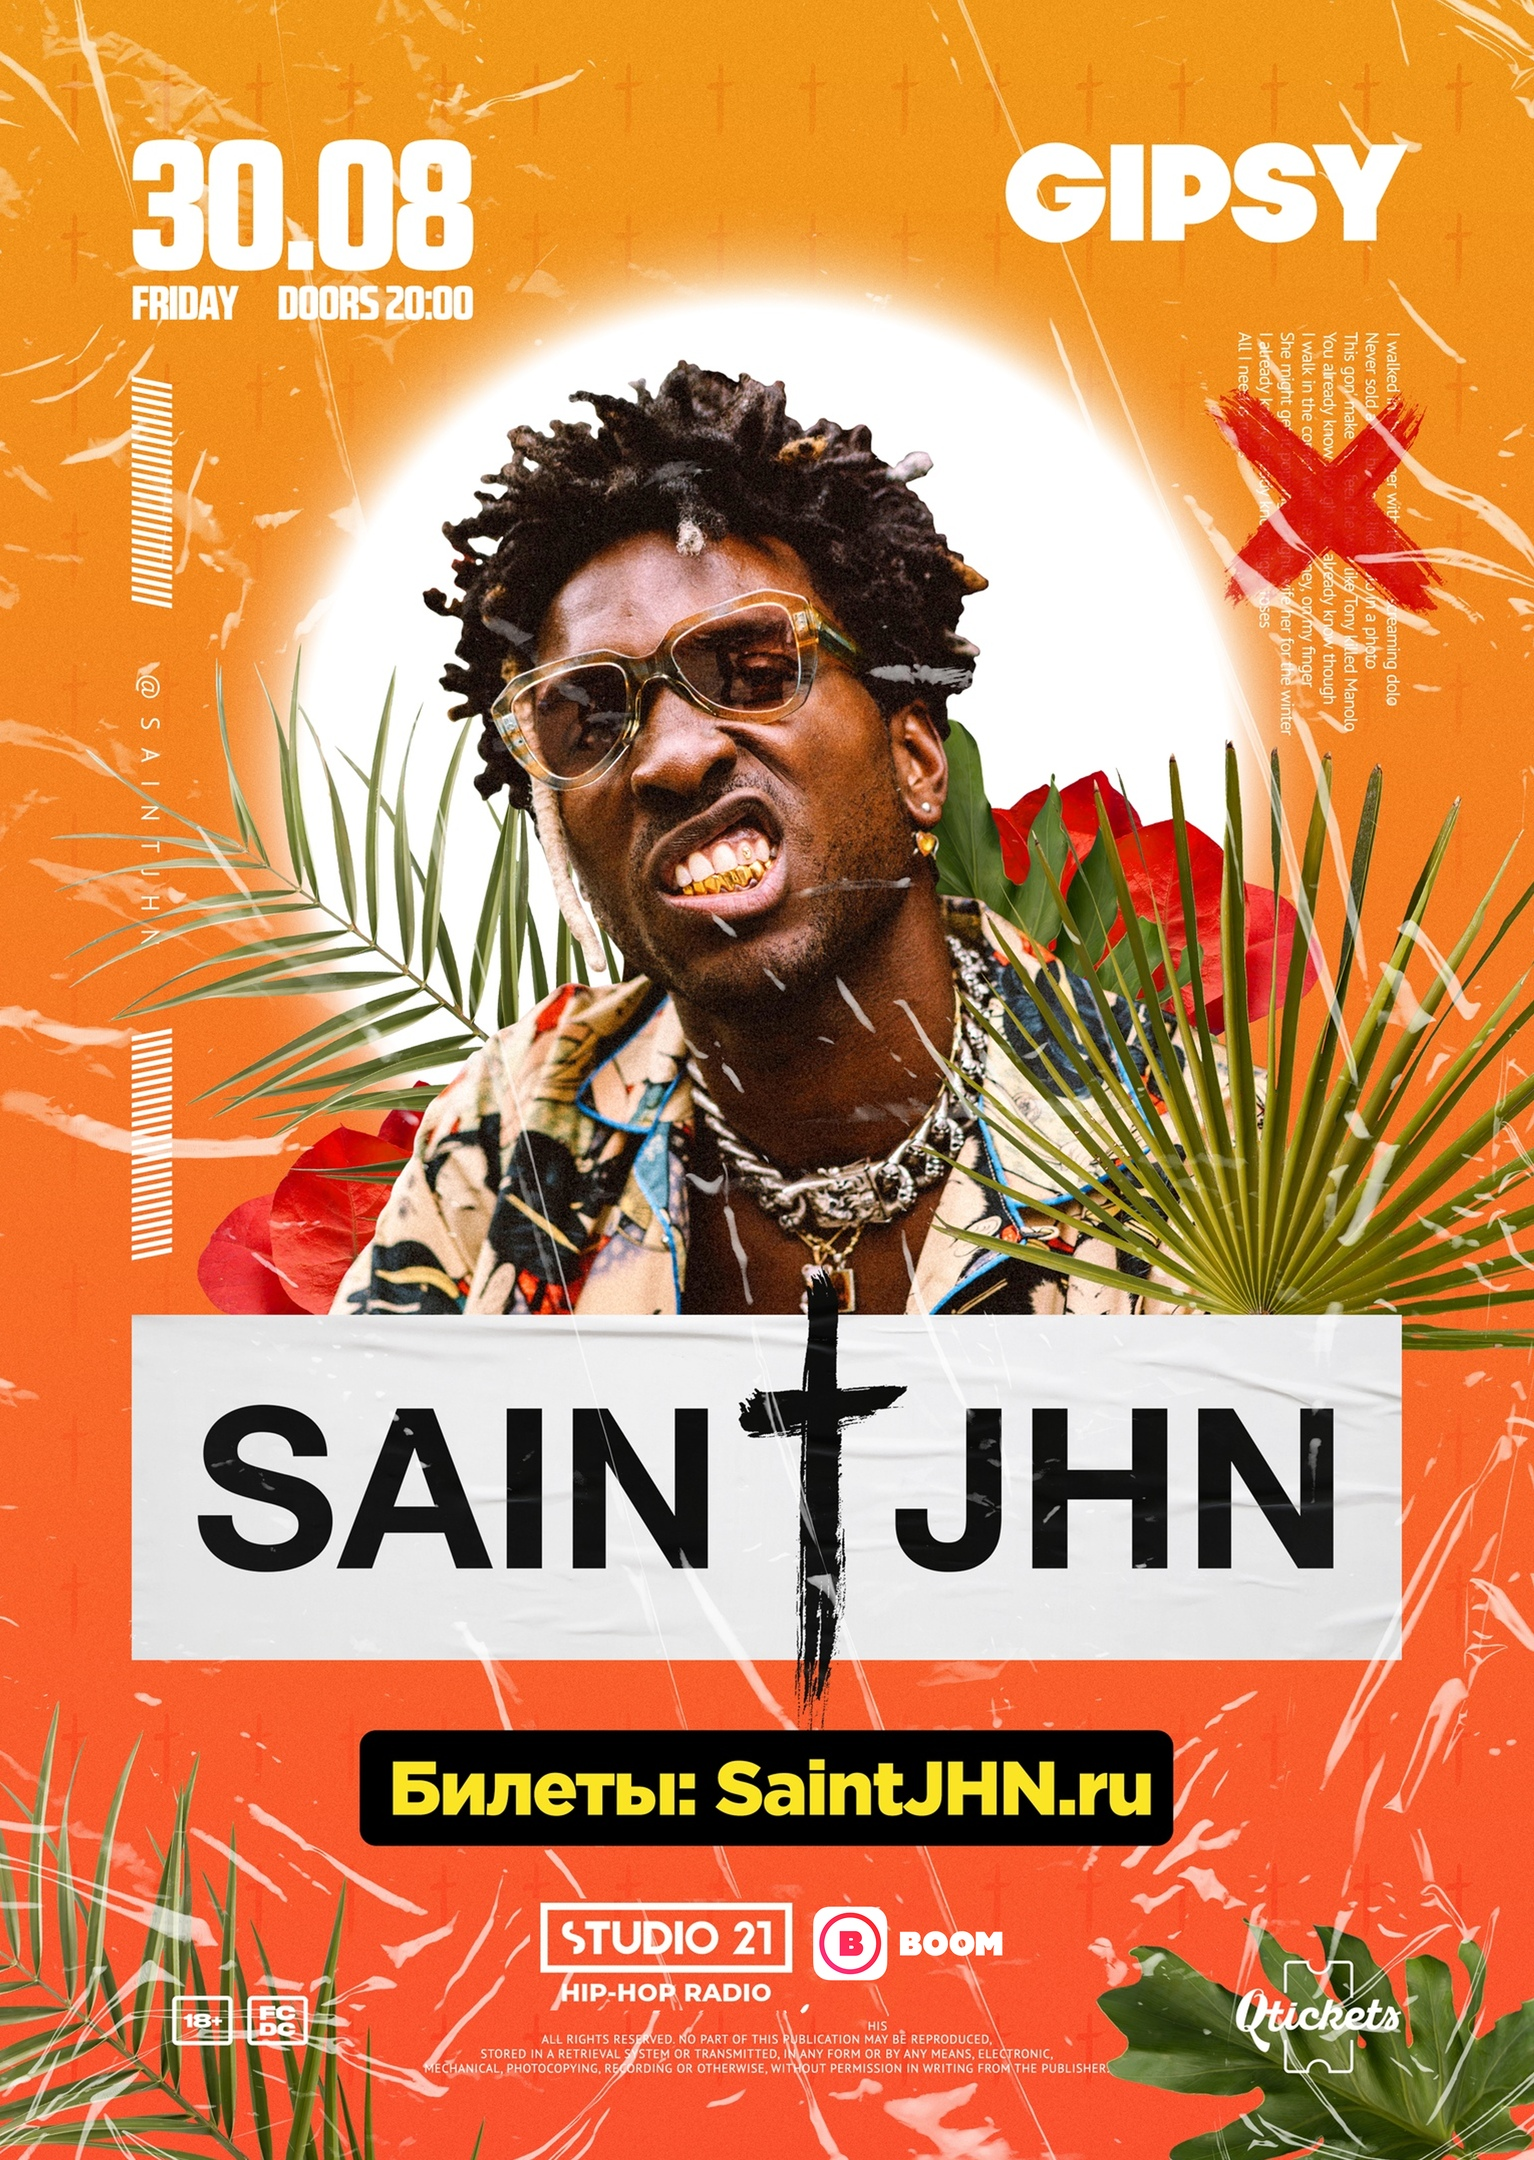 Saint JHN